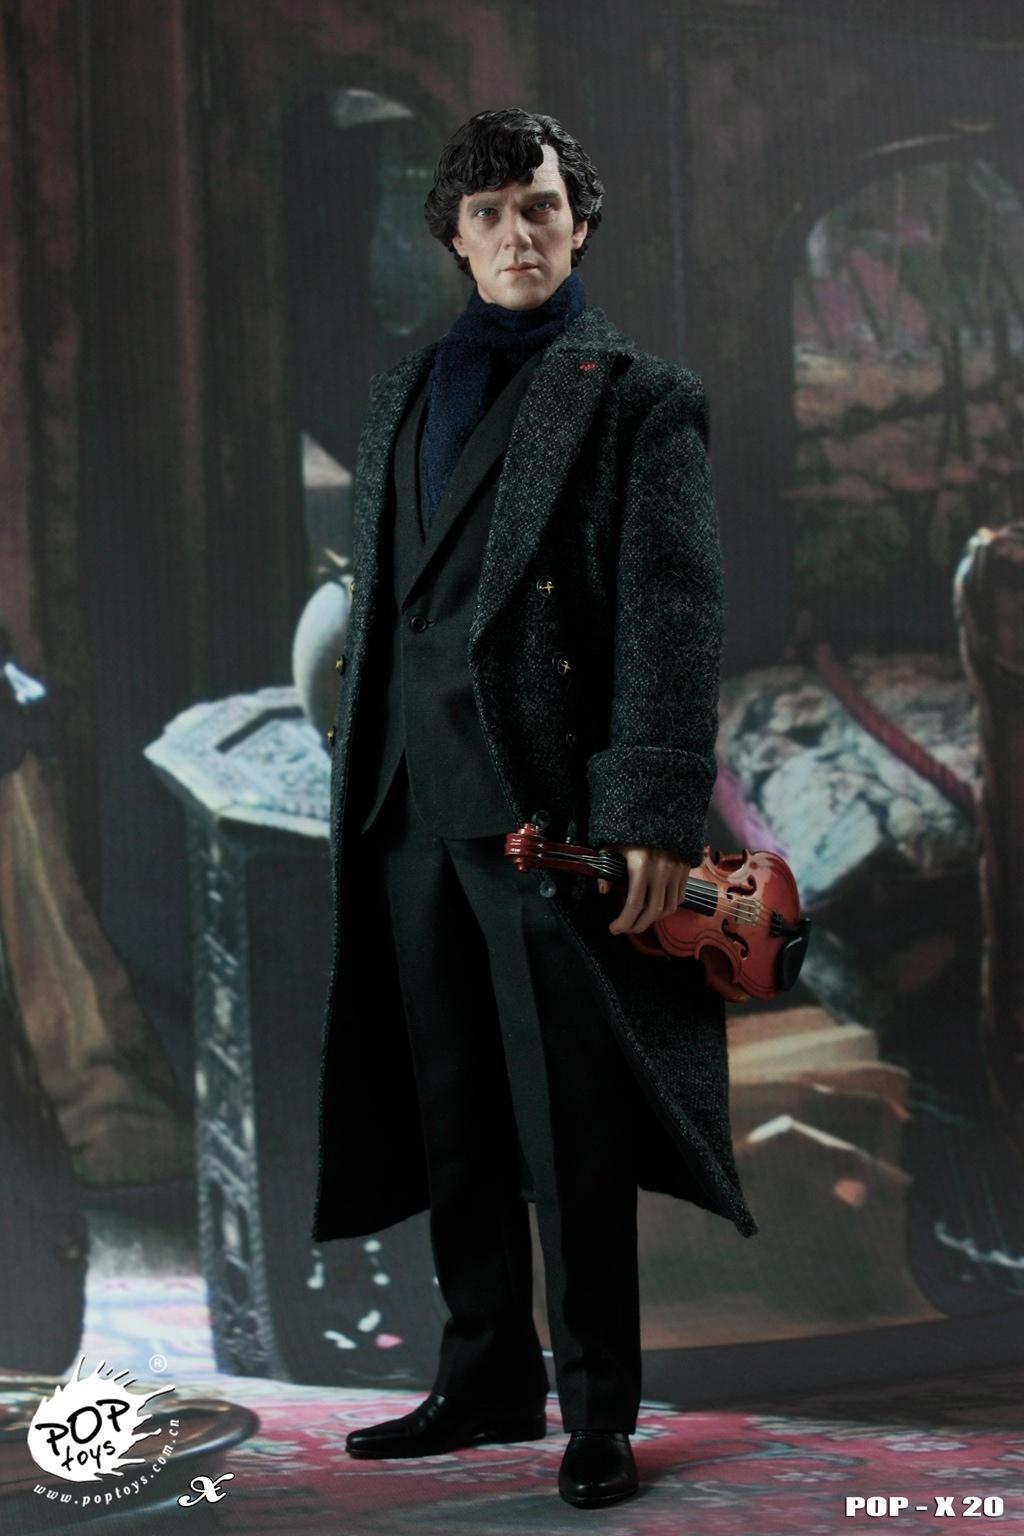 [Pop Toys] Sherlock 1/6 scale 102517t9wfw8ts1x2qwq1q